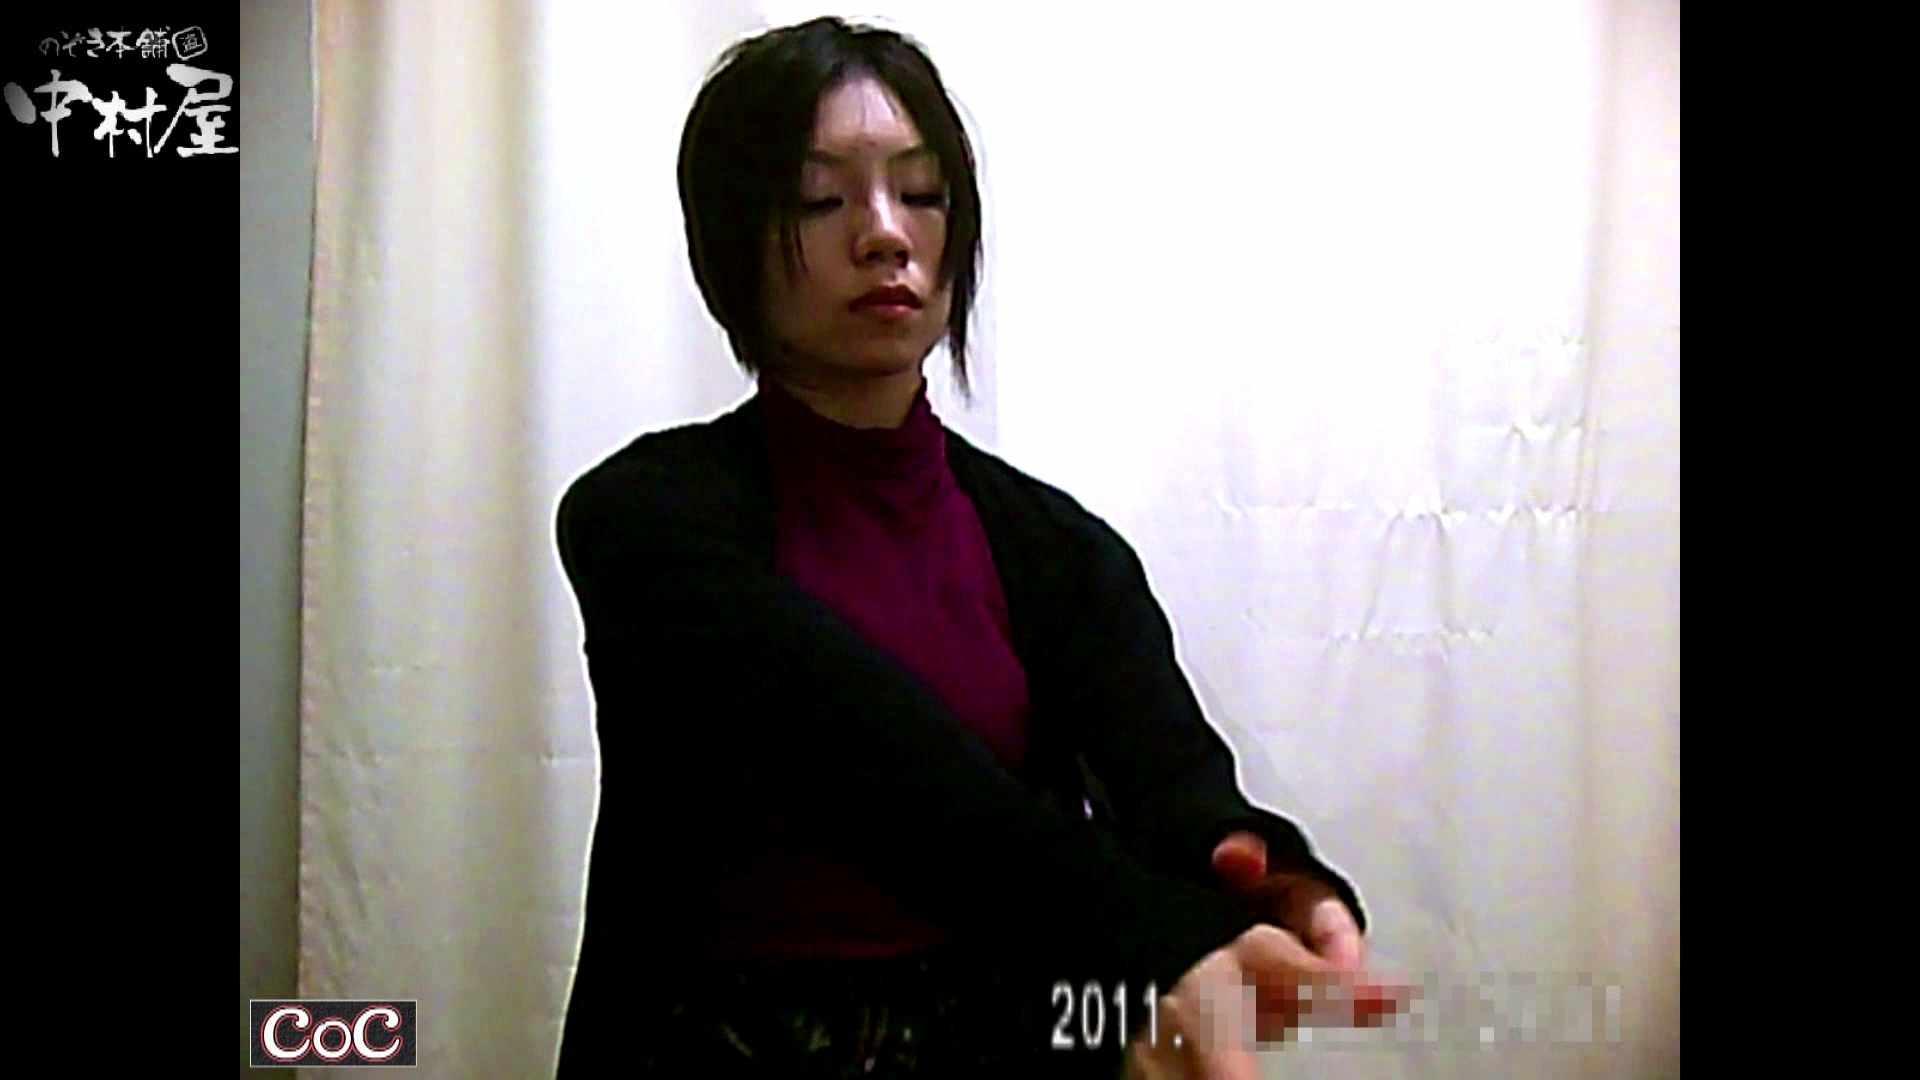 Doctor-X元医者による反抗vol.65 おまんこ見放題  102PIX 16